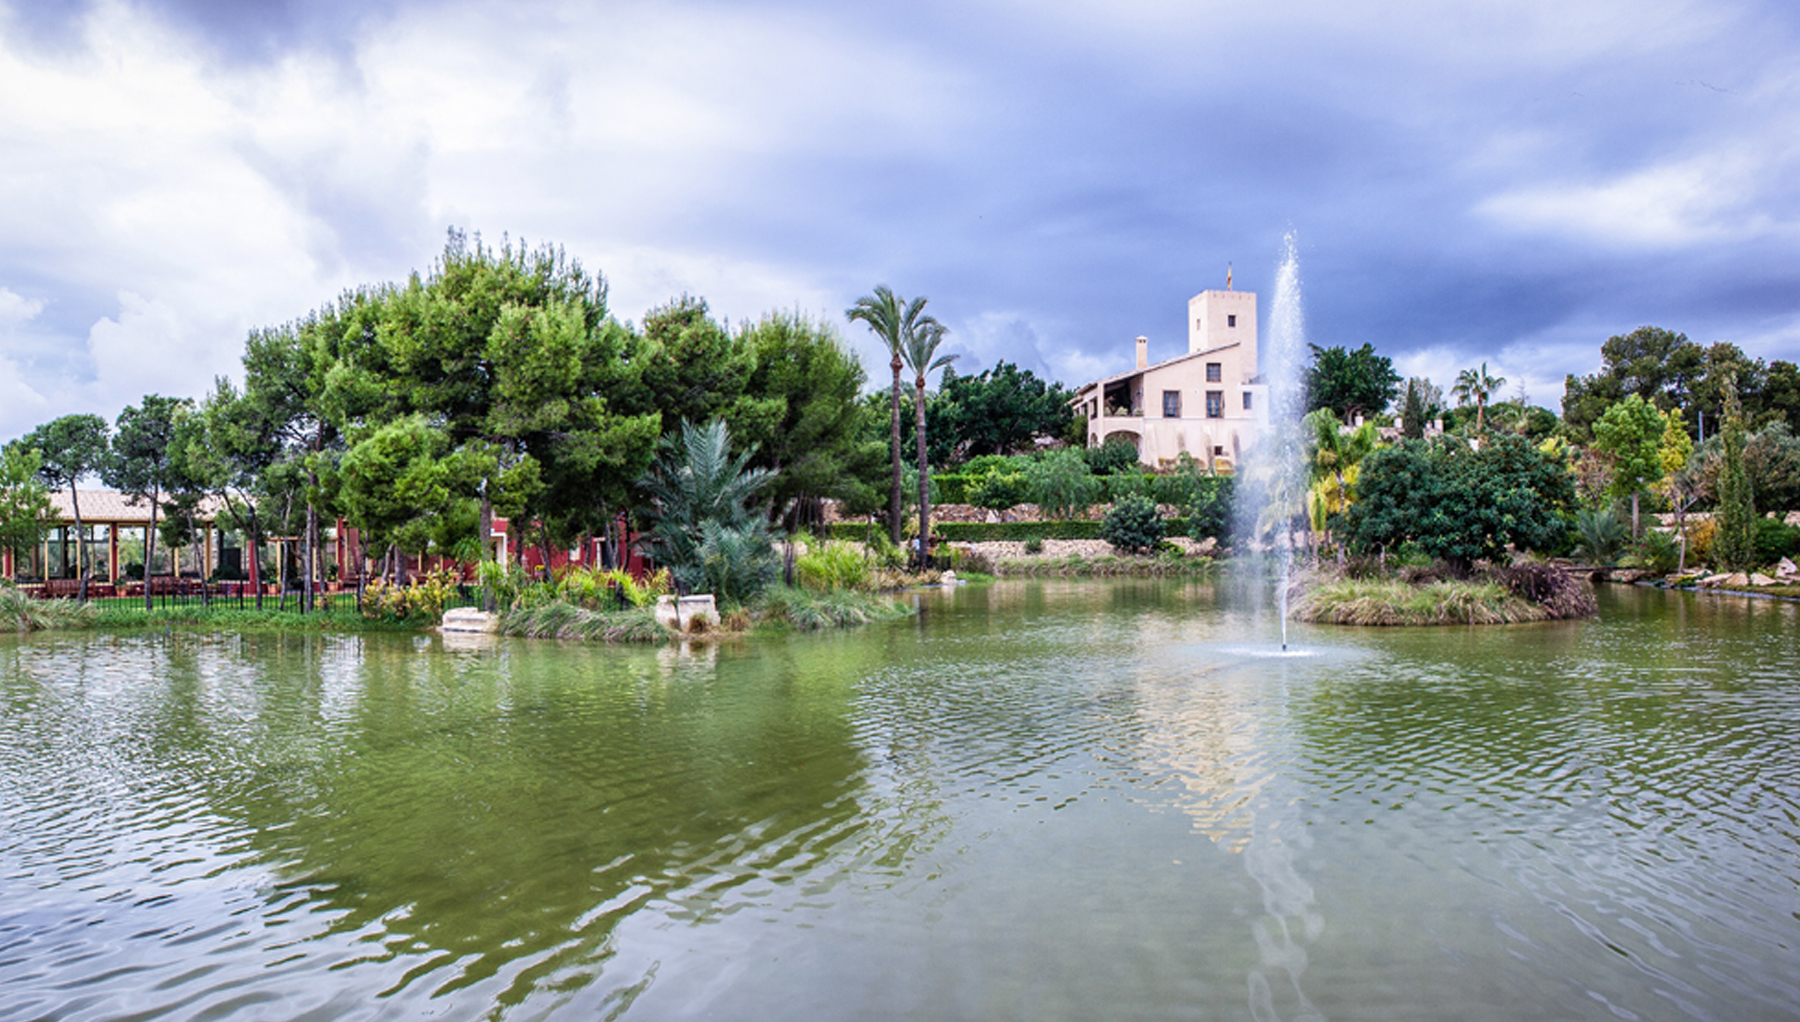 Diseno de jardines madrid david jim nez arquitectura y paisajismo en madrid - Diseno jardines madrid ...